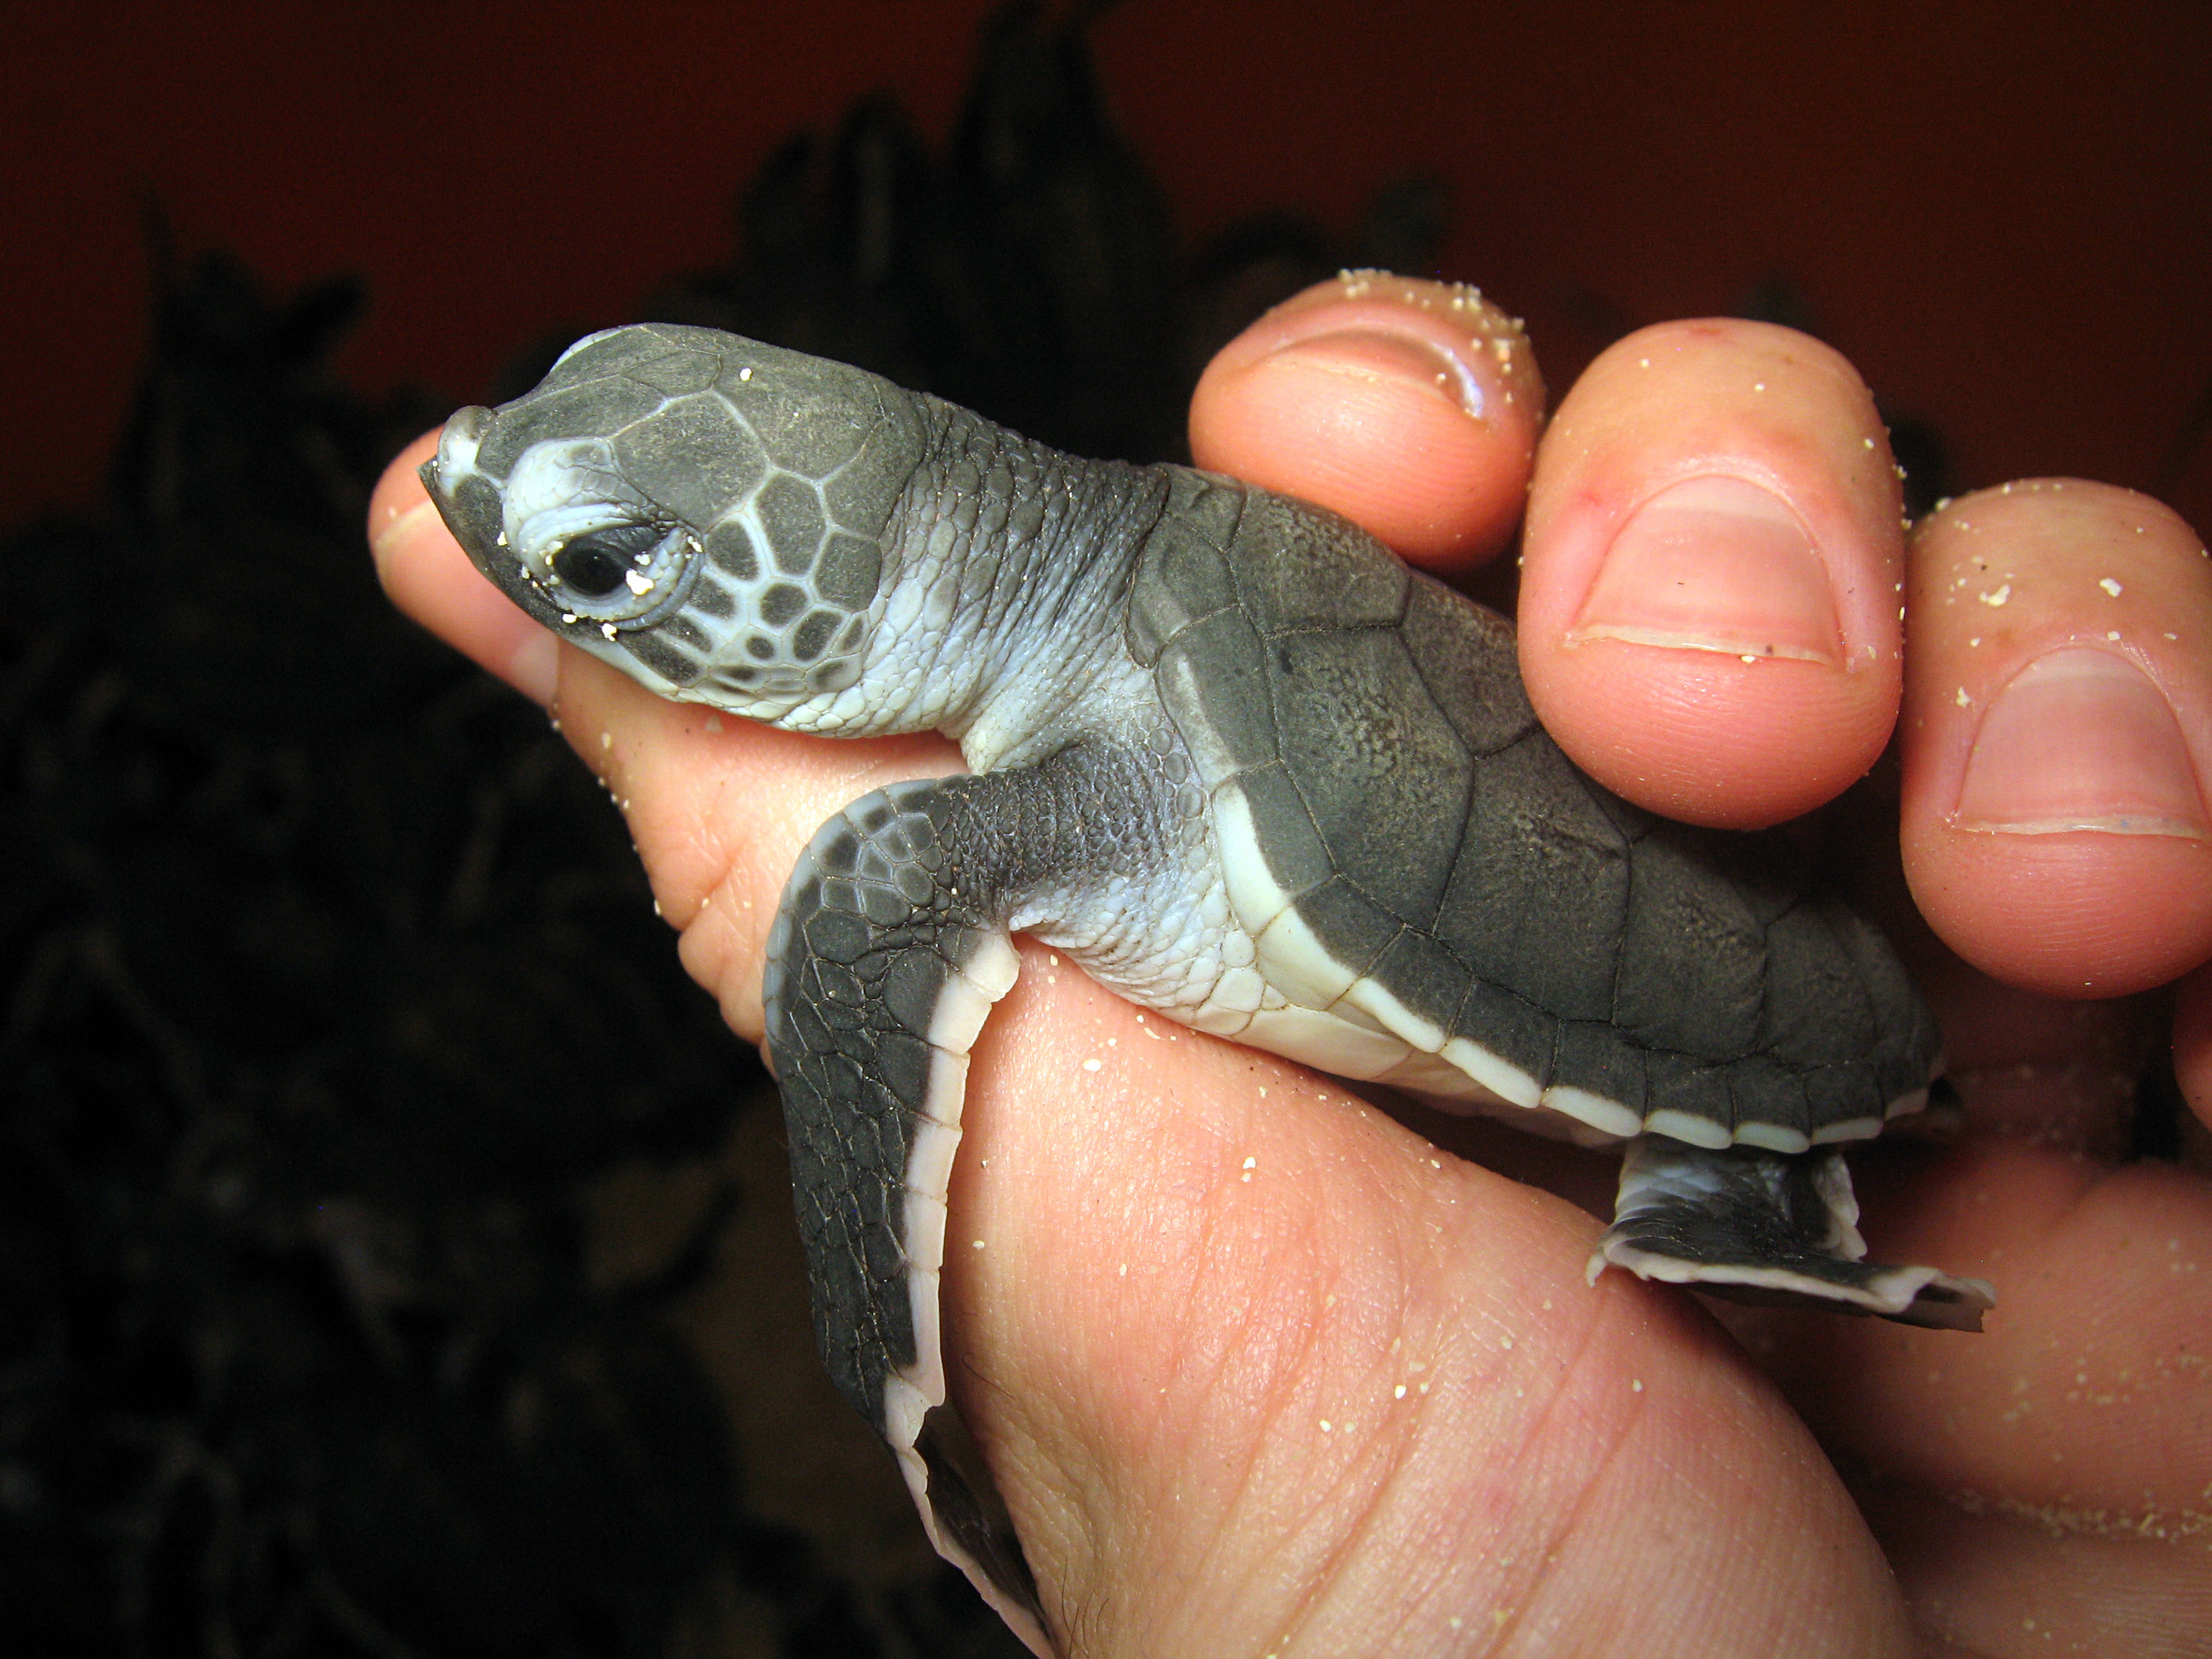 invite-to-paradise-sri-lanka-holidays-honeymoons-specialists-wildlife-baby-sea-turtle-hatchery-visit-habaraduwa-kosgoda-3.jpg